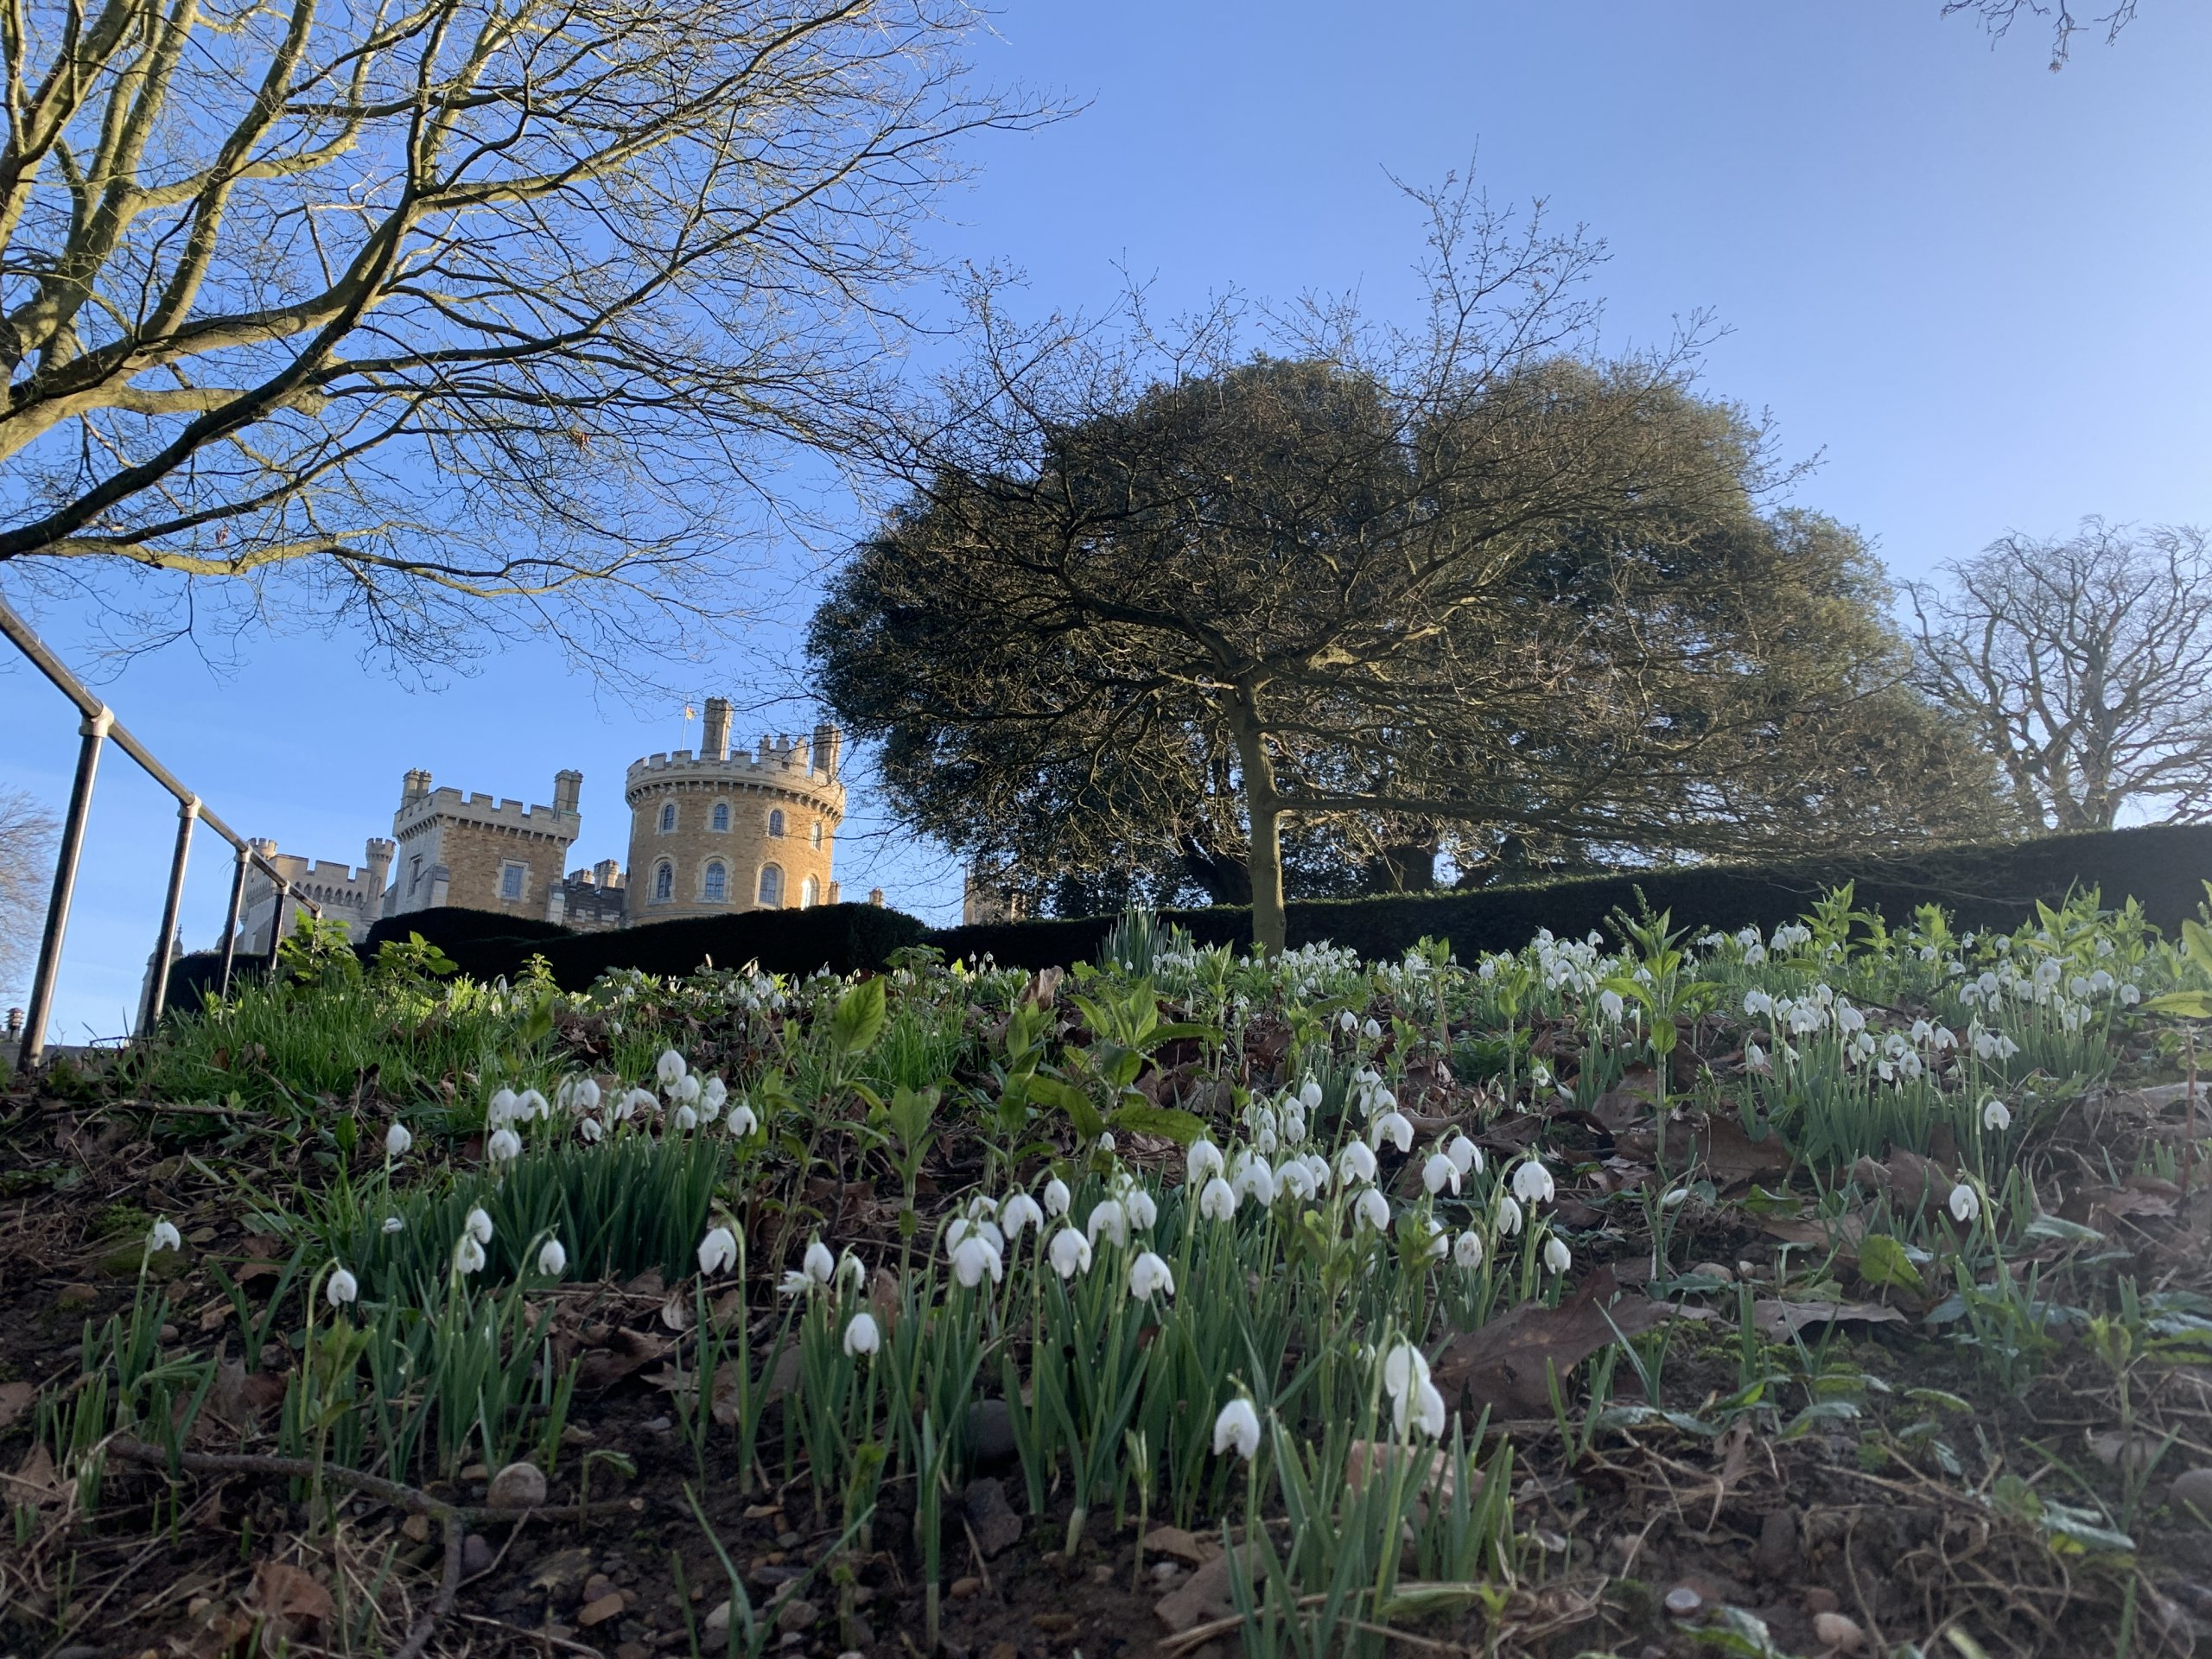 Snowdrops in front of Belvoir Castle